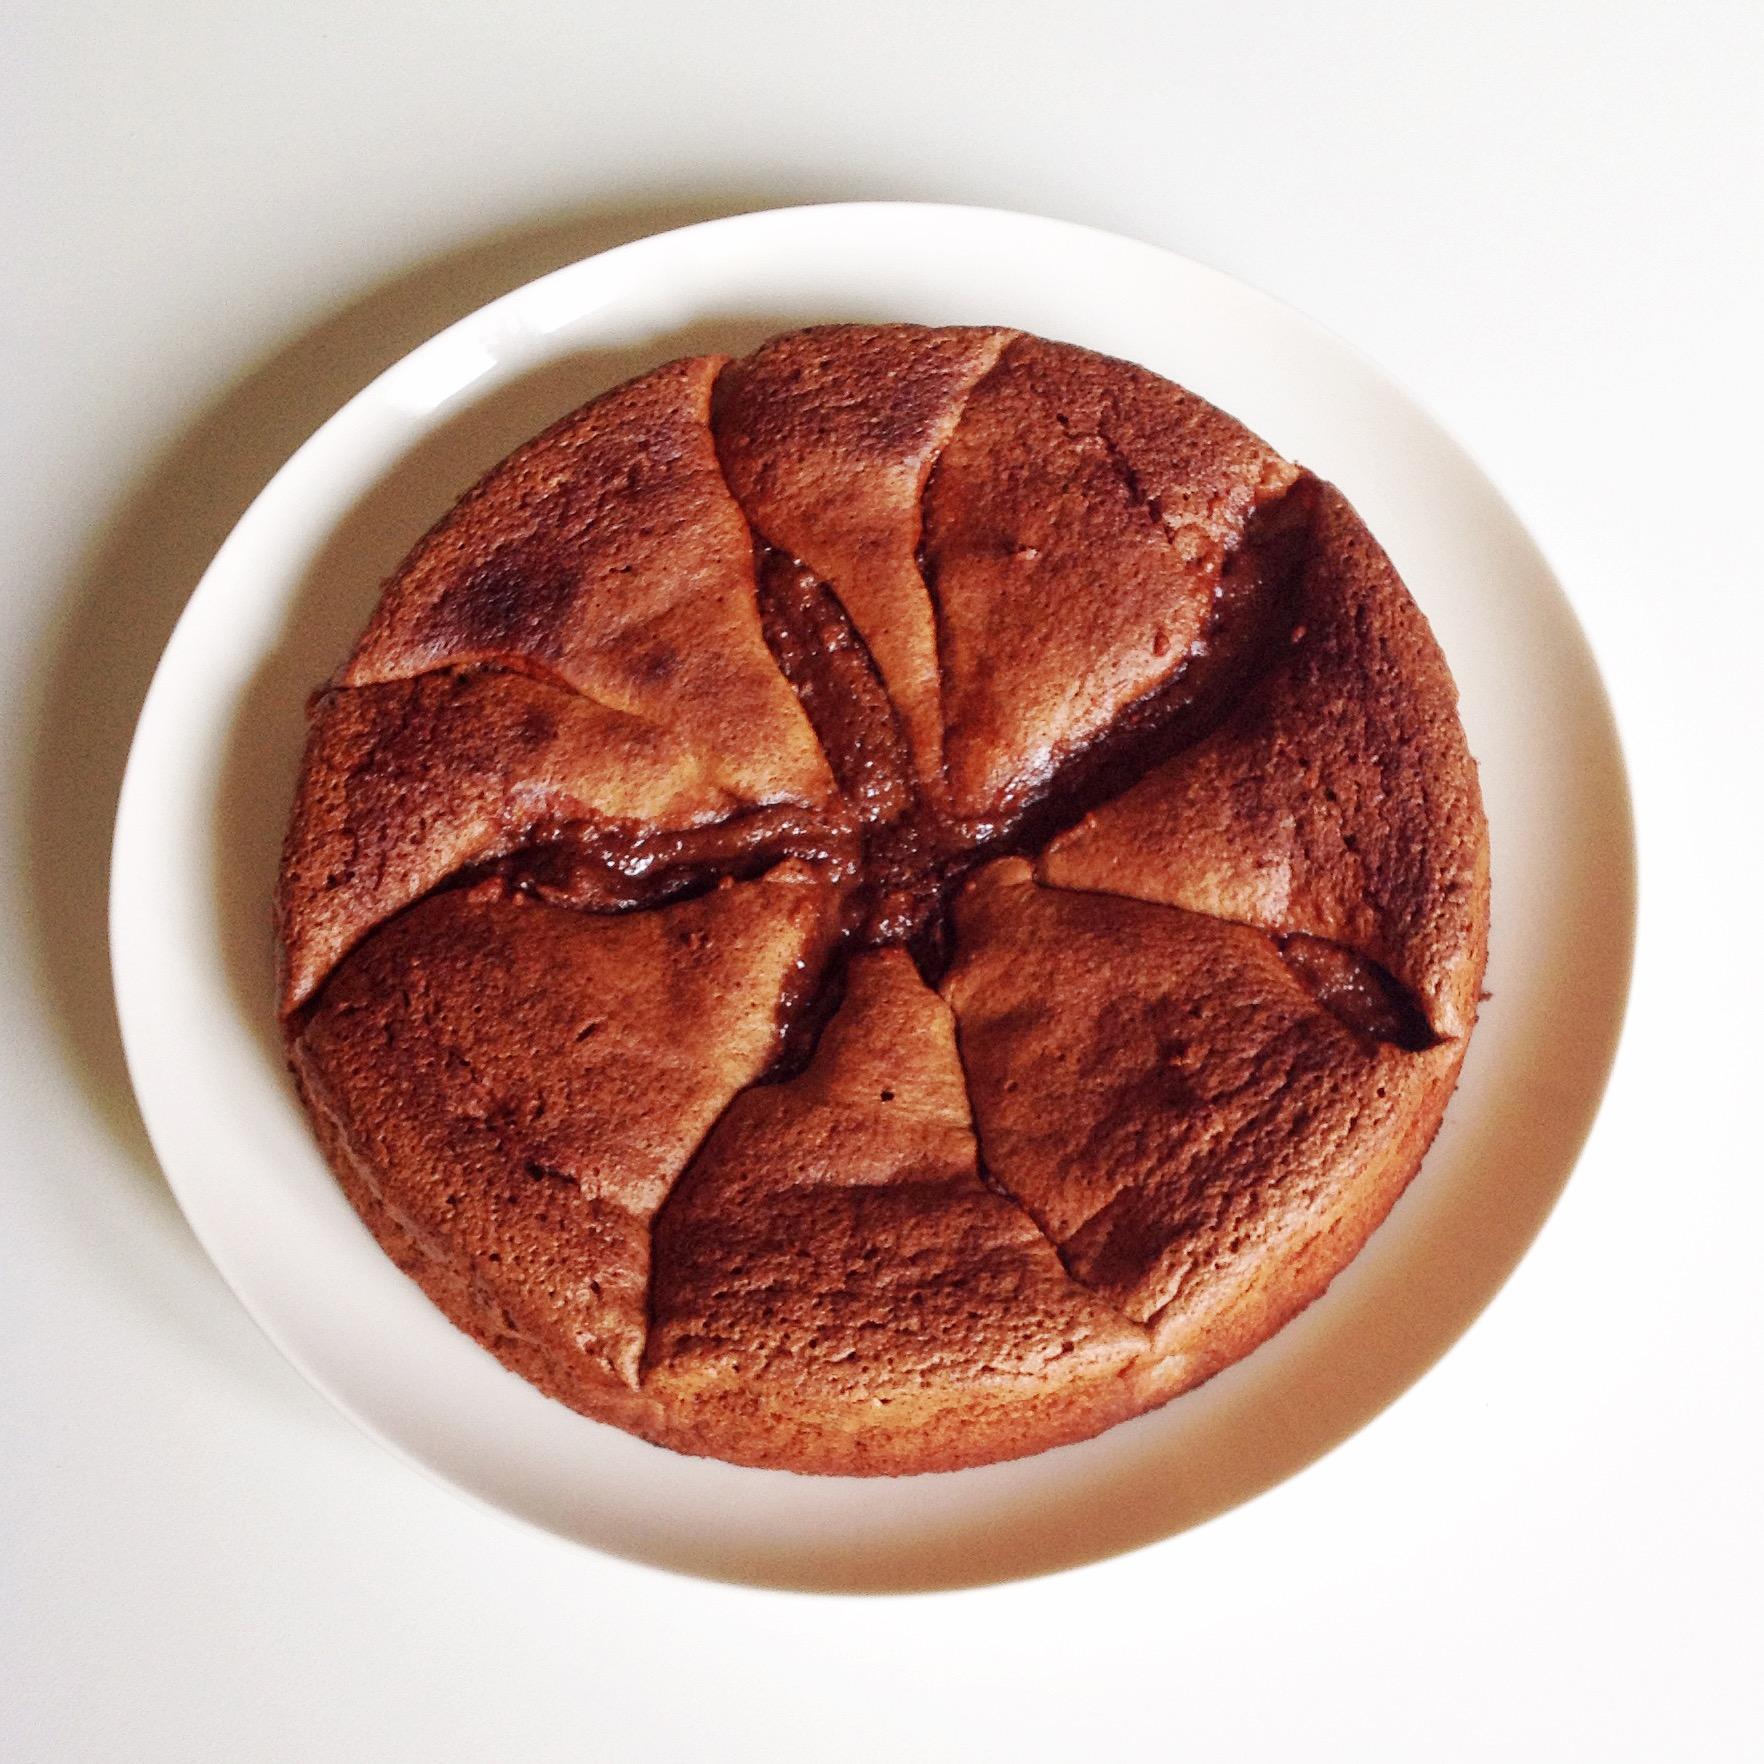 Ricerca ricette con cucina moderna oro cioccolato pere - Cucina moderna oro ...